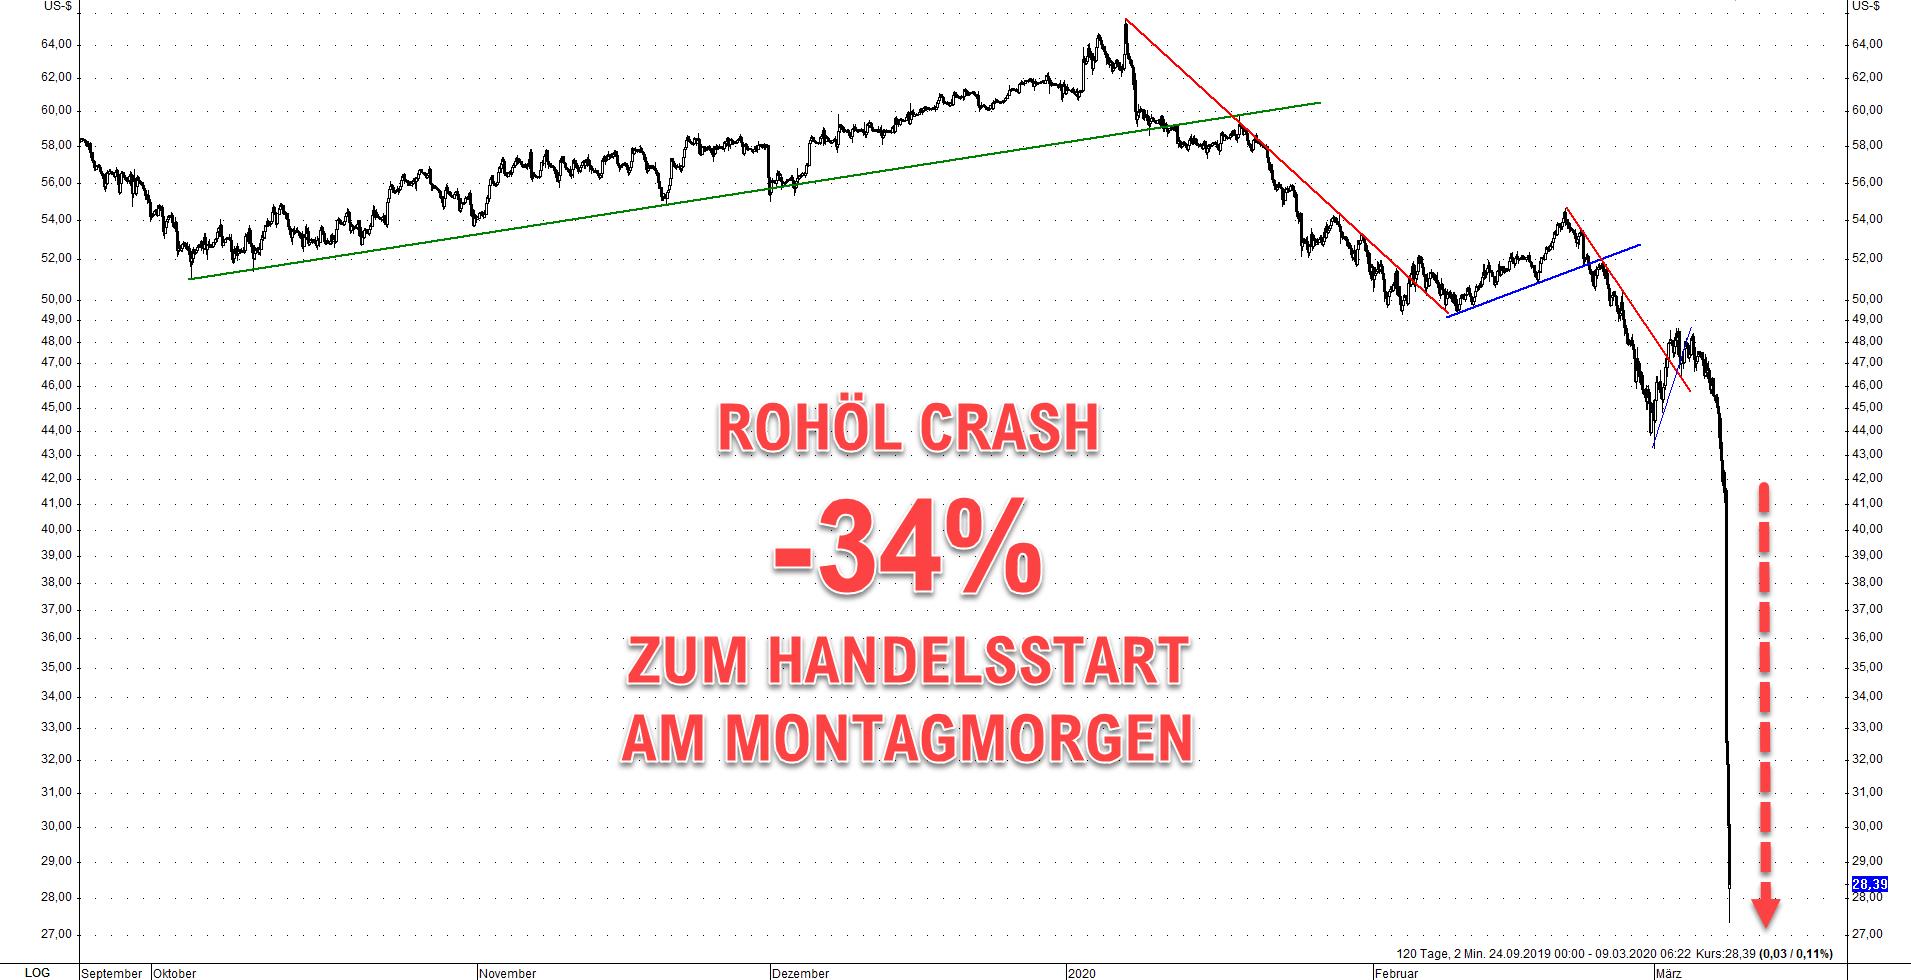 Rohöl-Crash